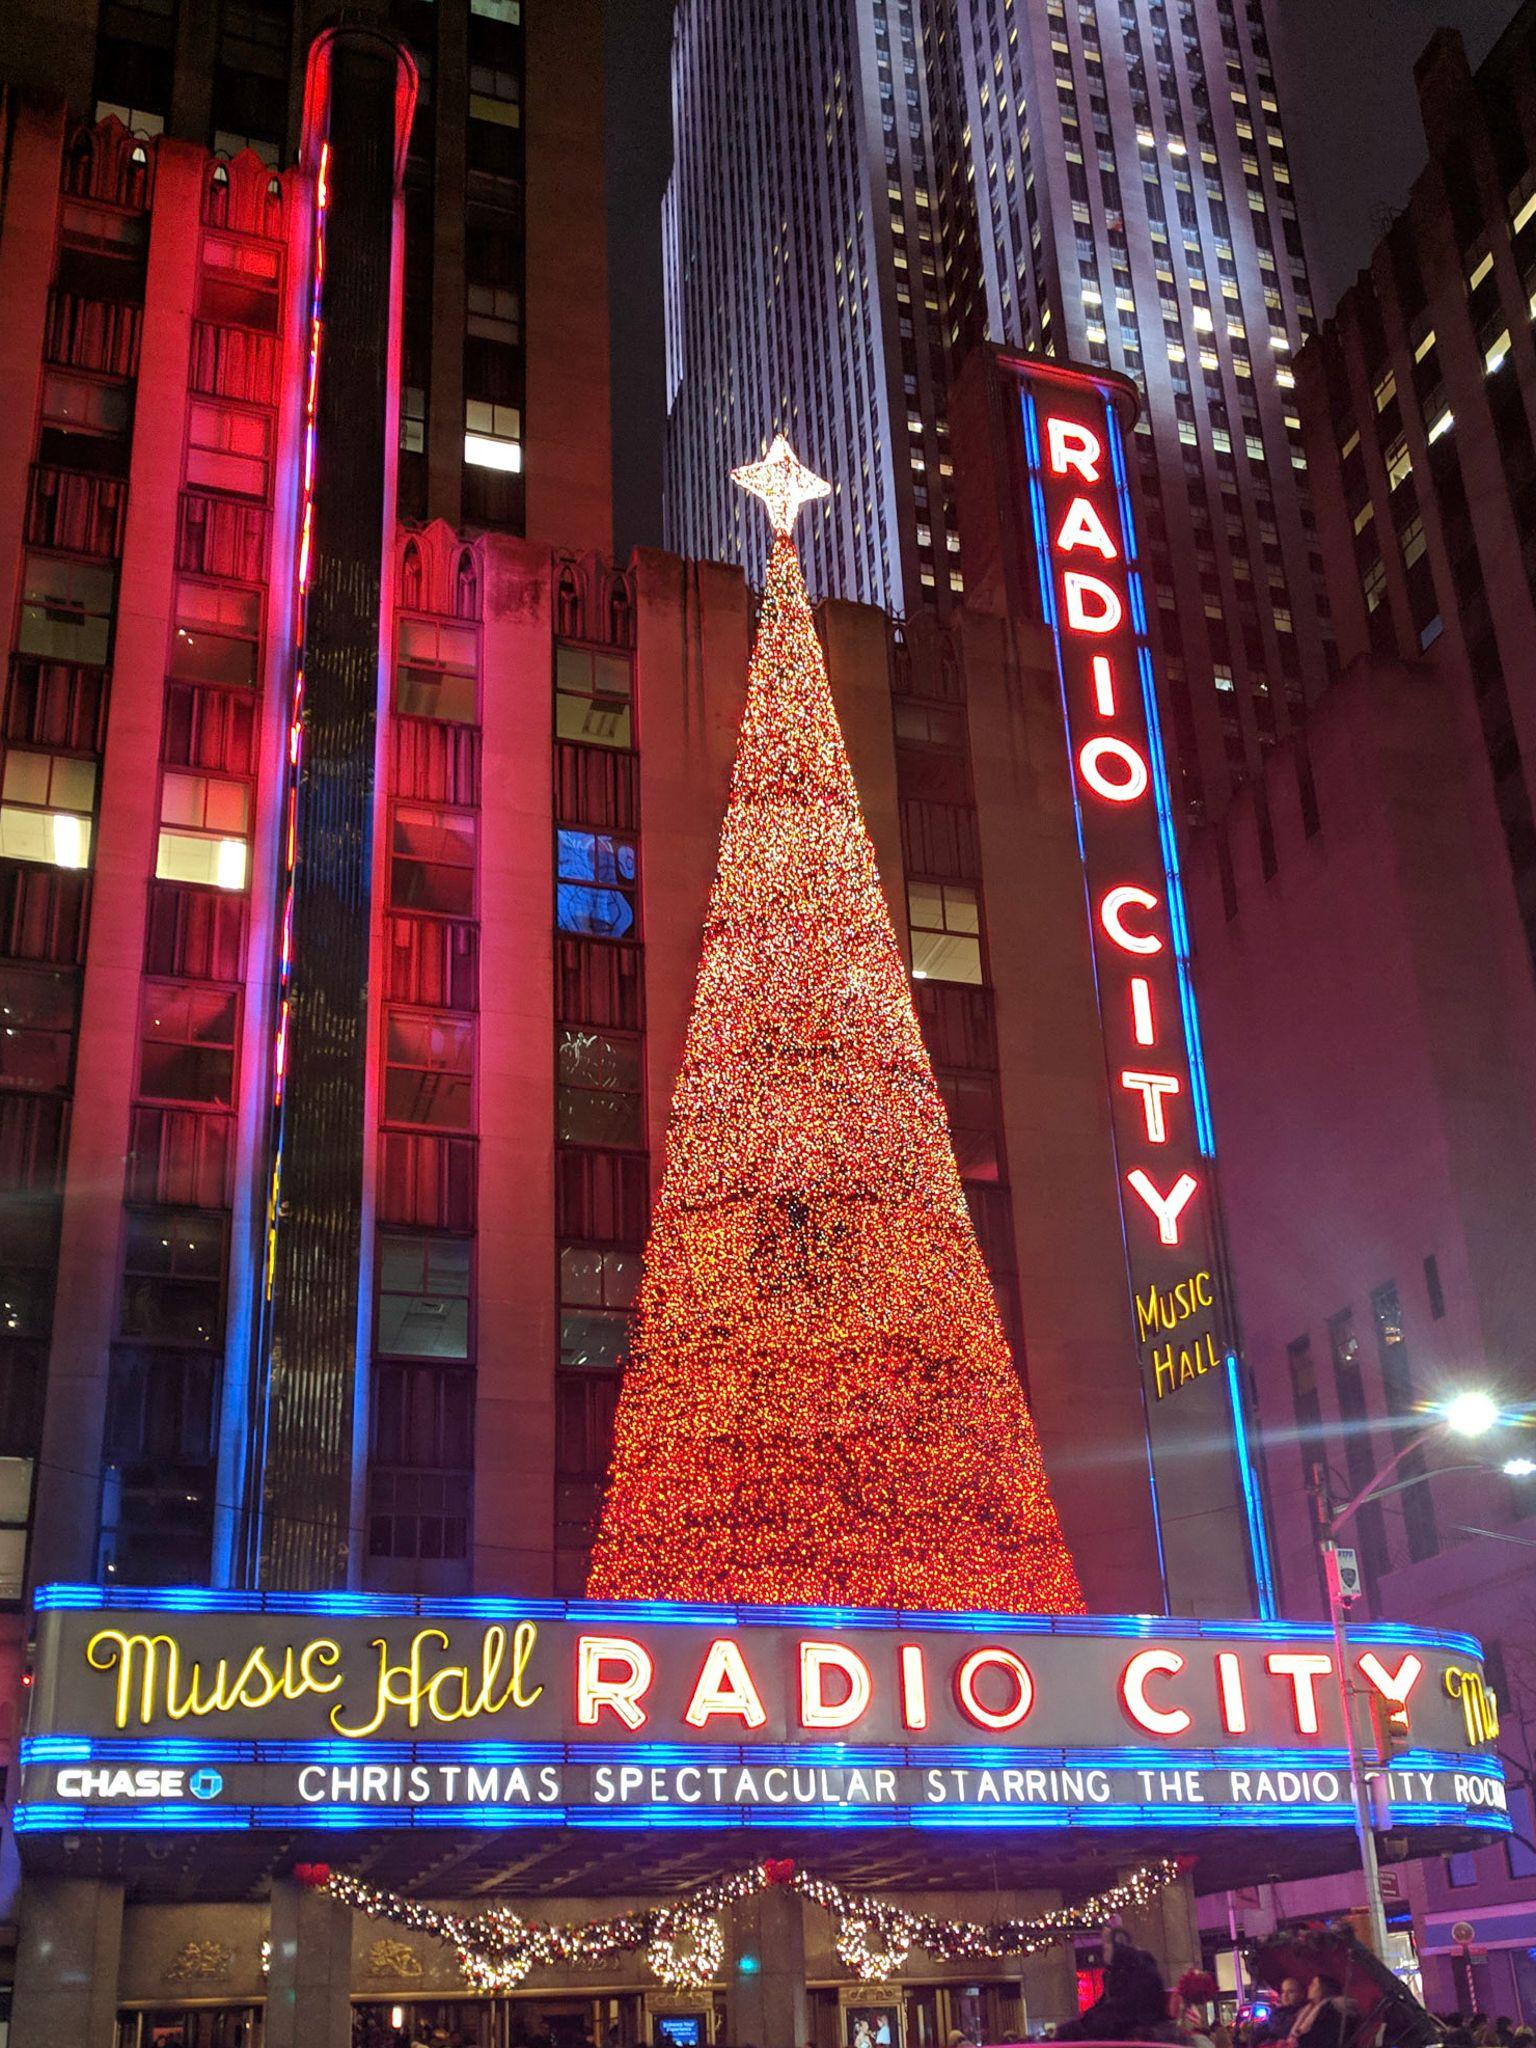 New York City at Christmas Christmas spectacular